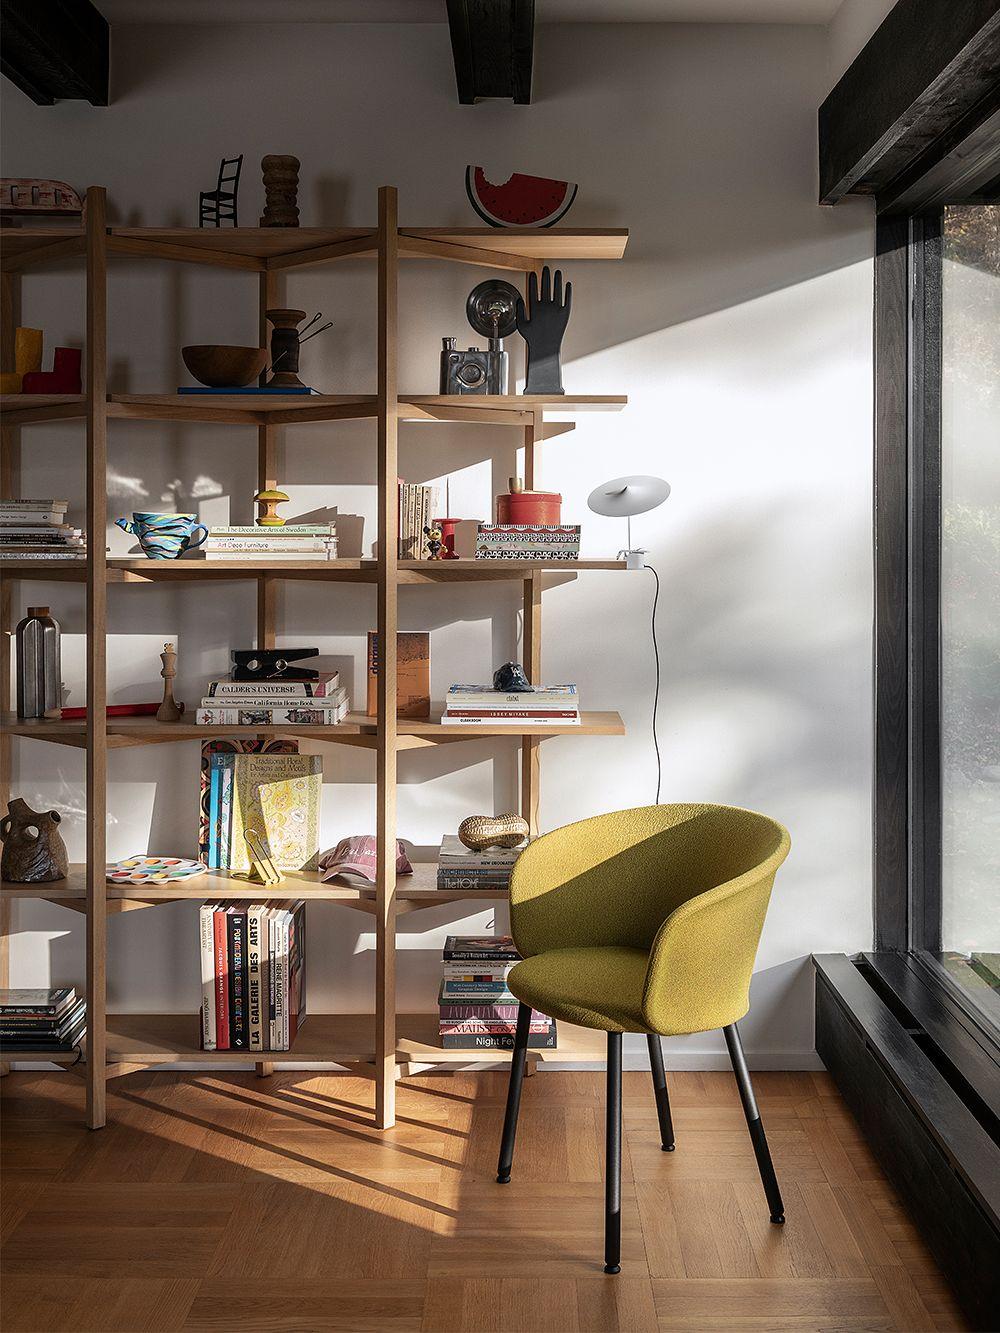 Hem's Zig Zag shelf in living room decor.